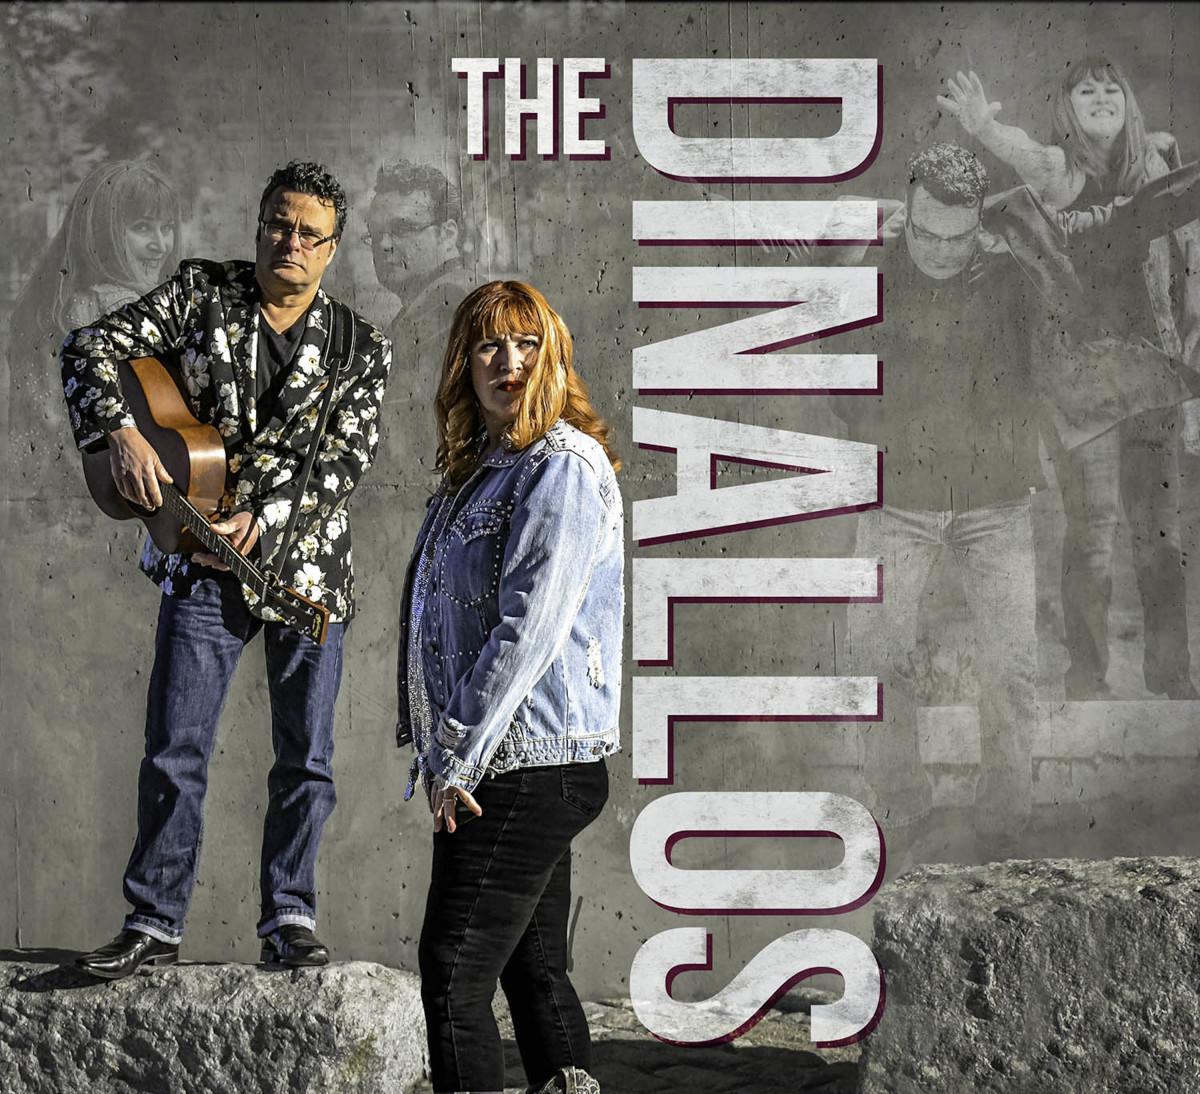 The Dinallos